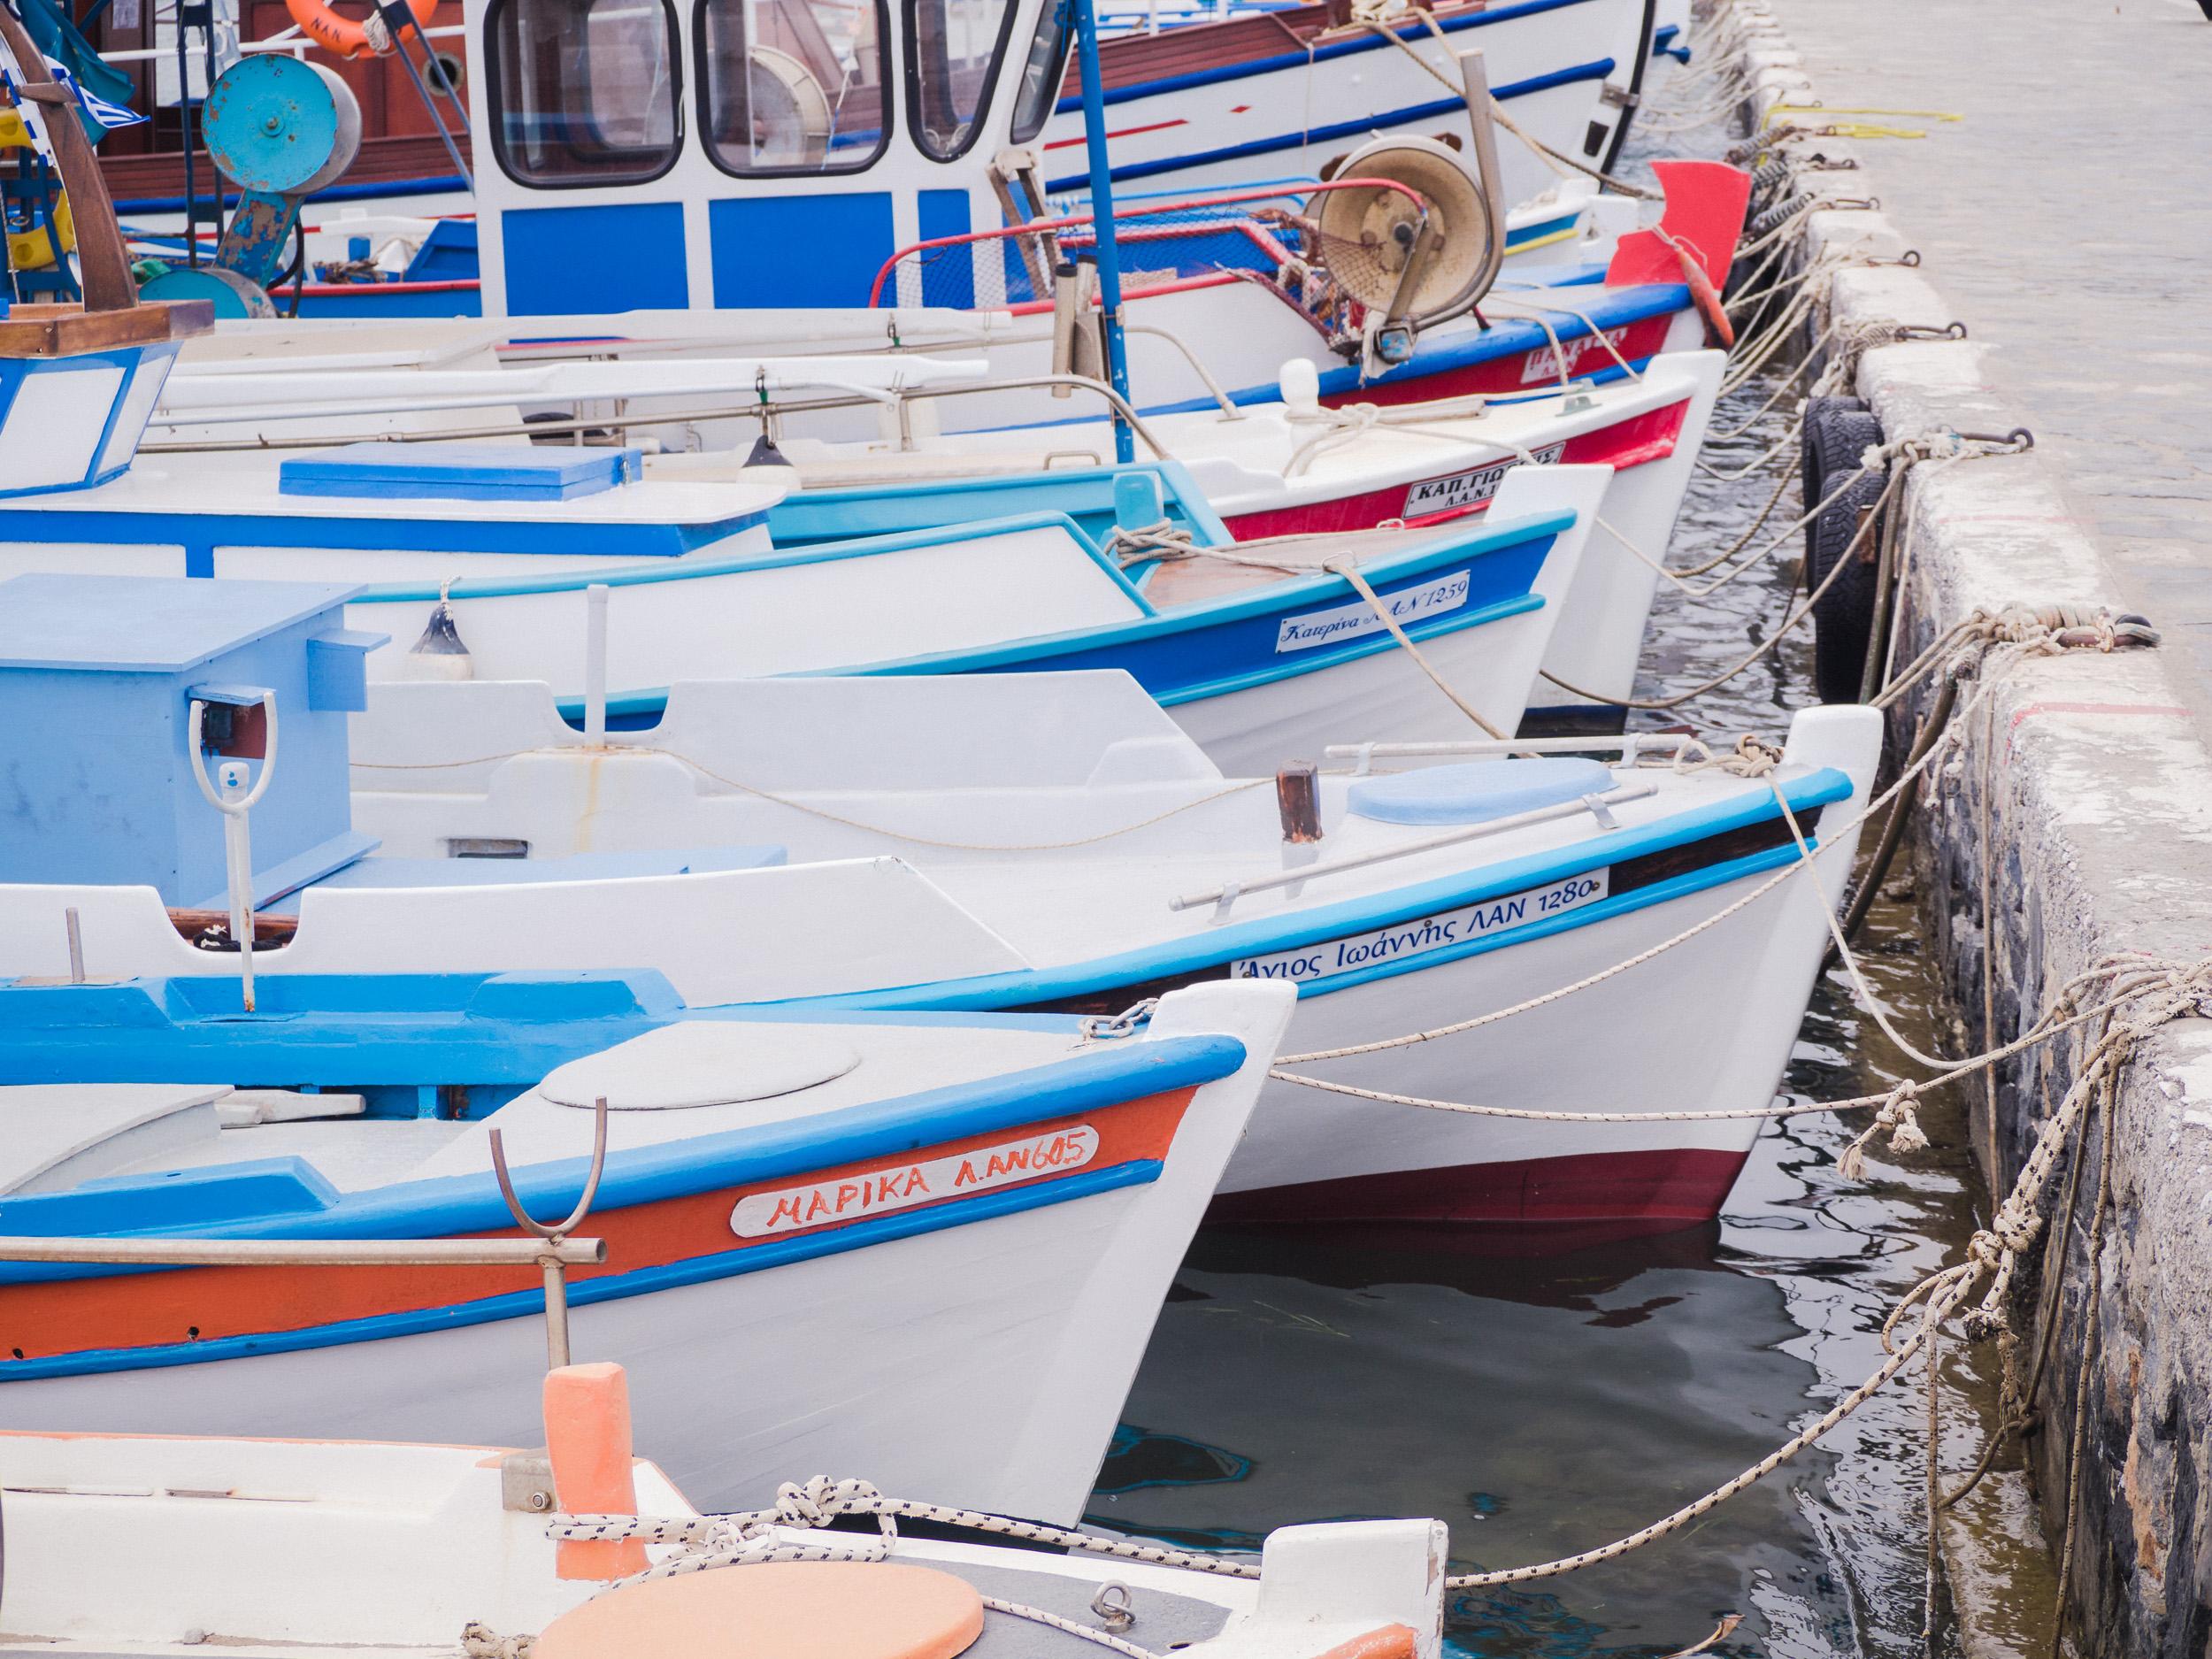 Crete-5200251.jpg